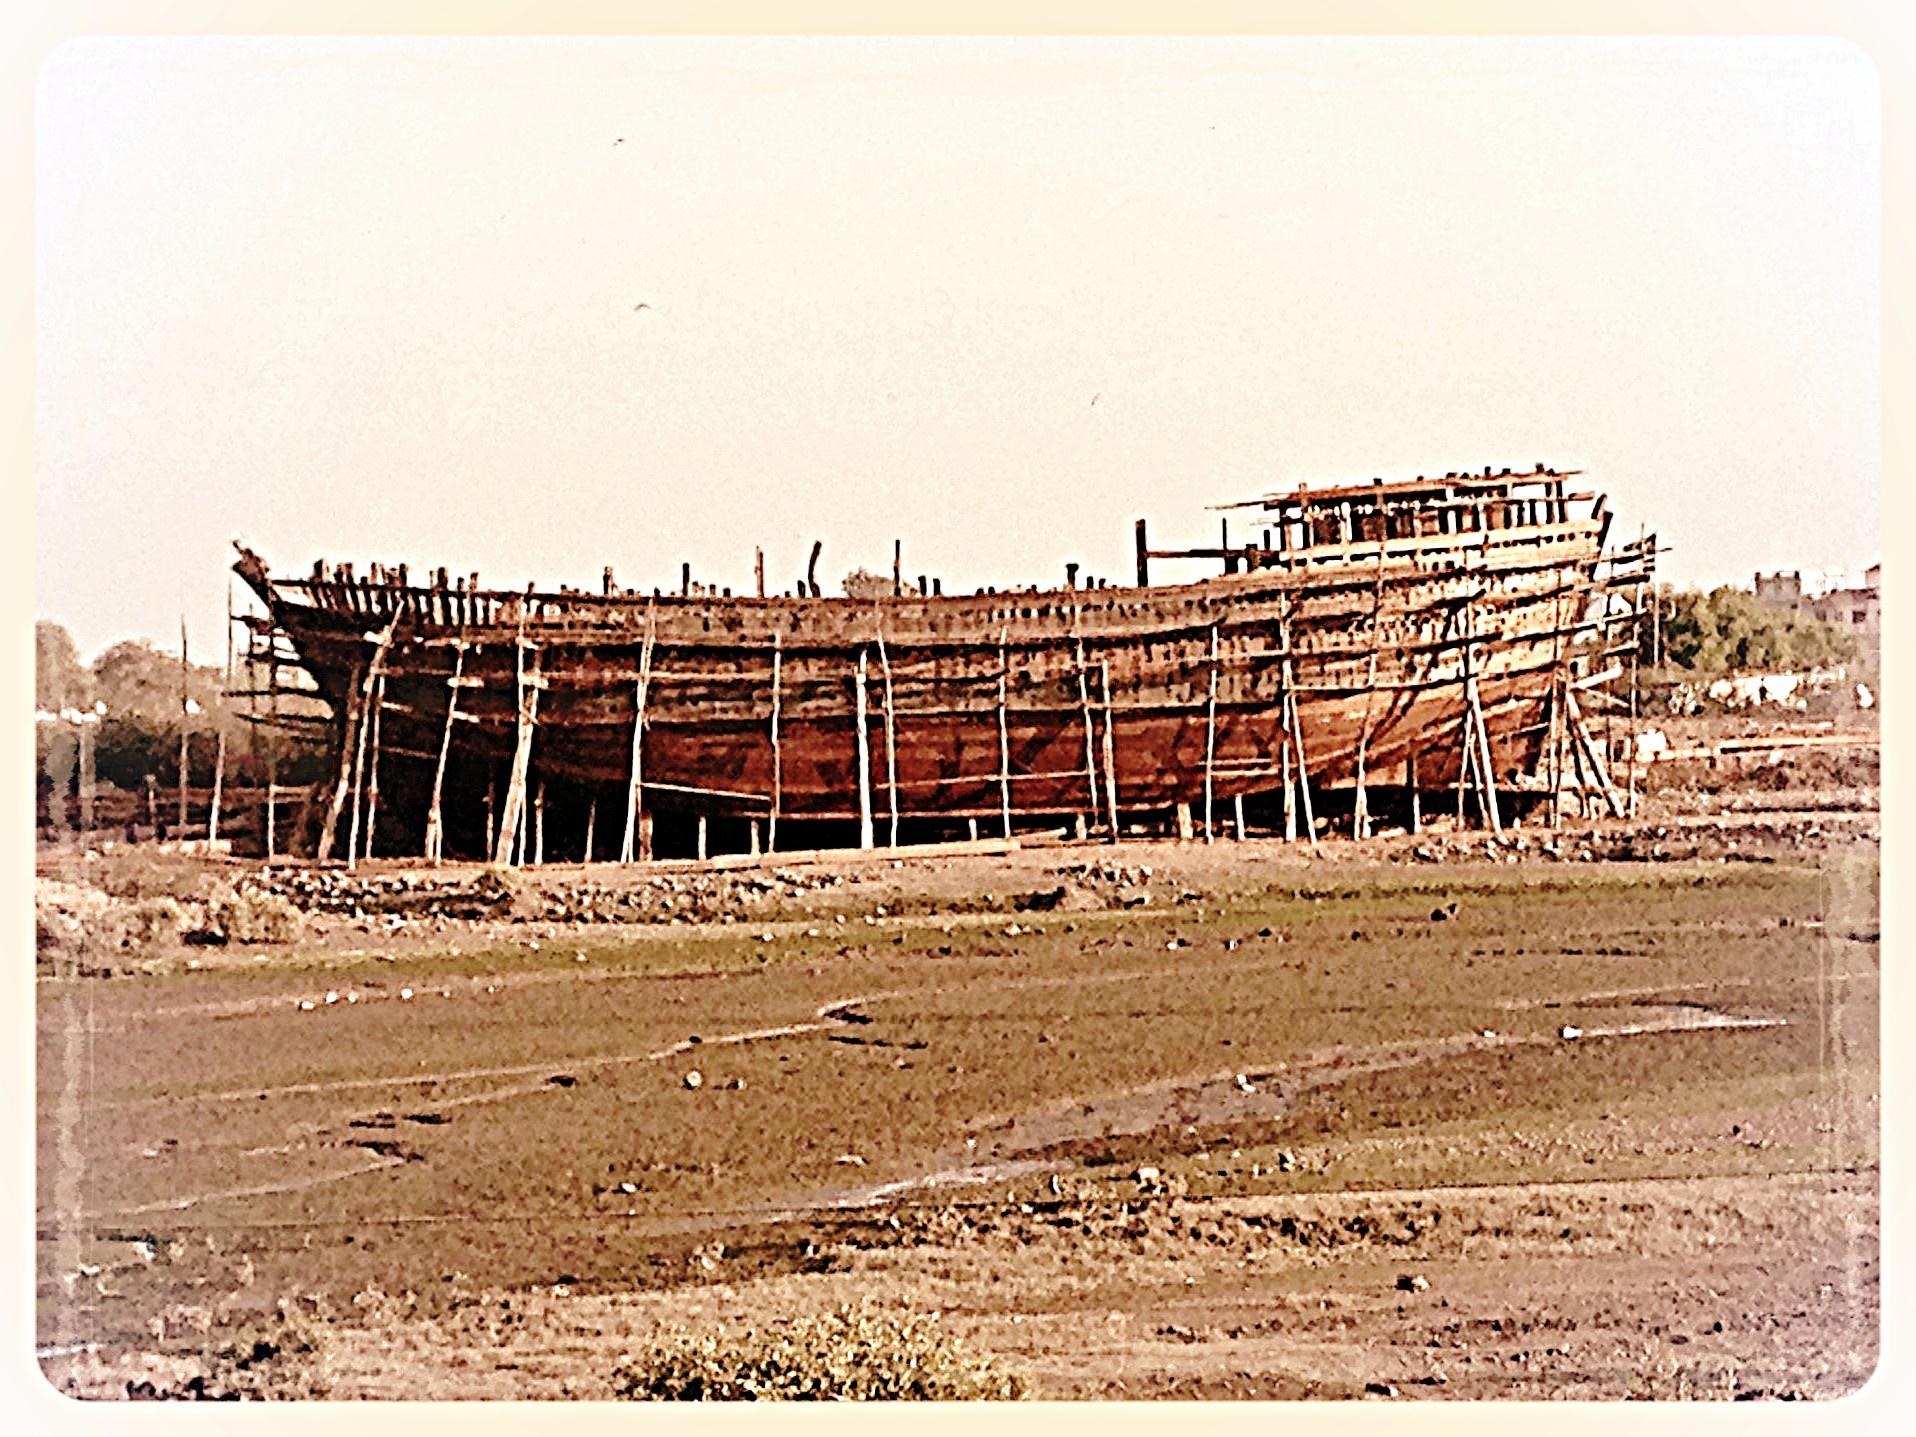 A timber dhow under construction at Mandvi, Gujurat.